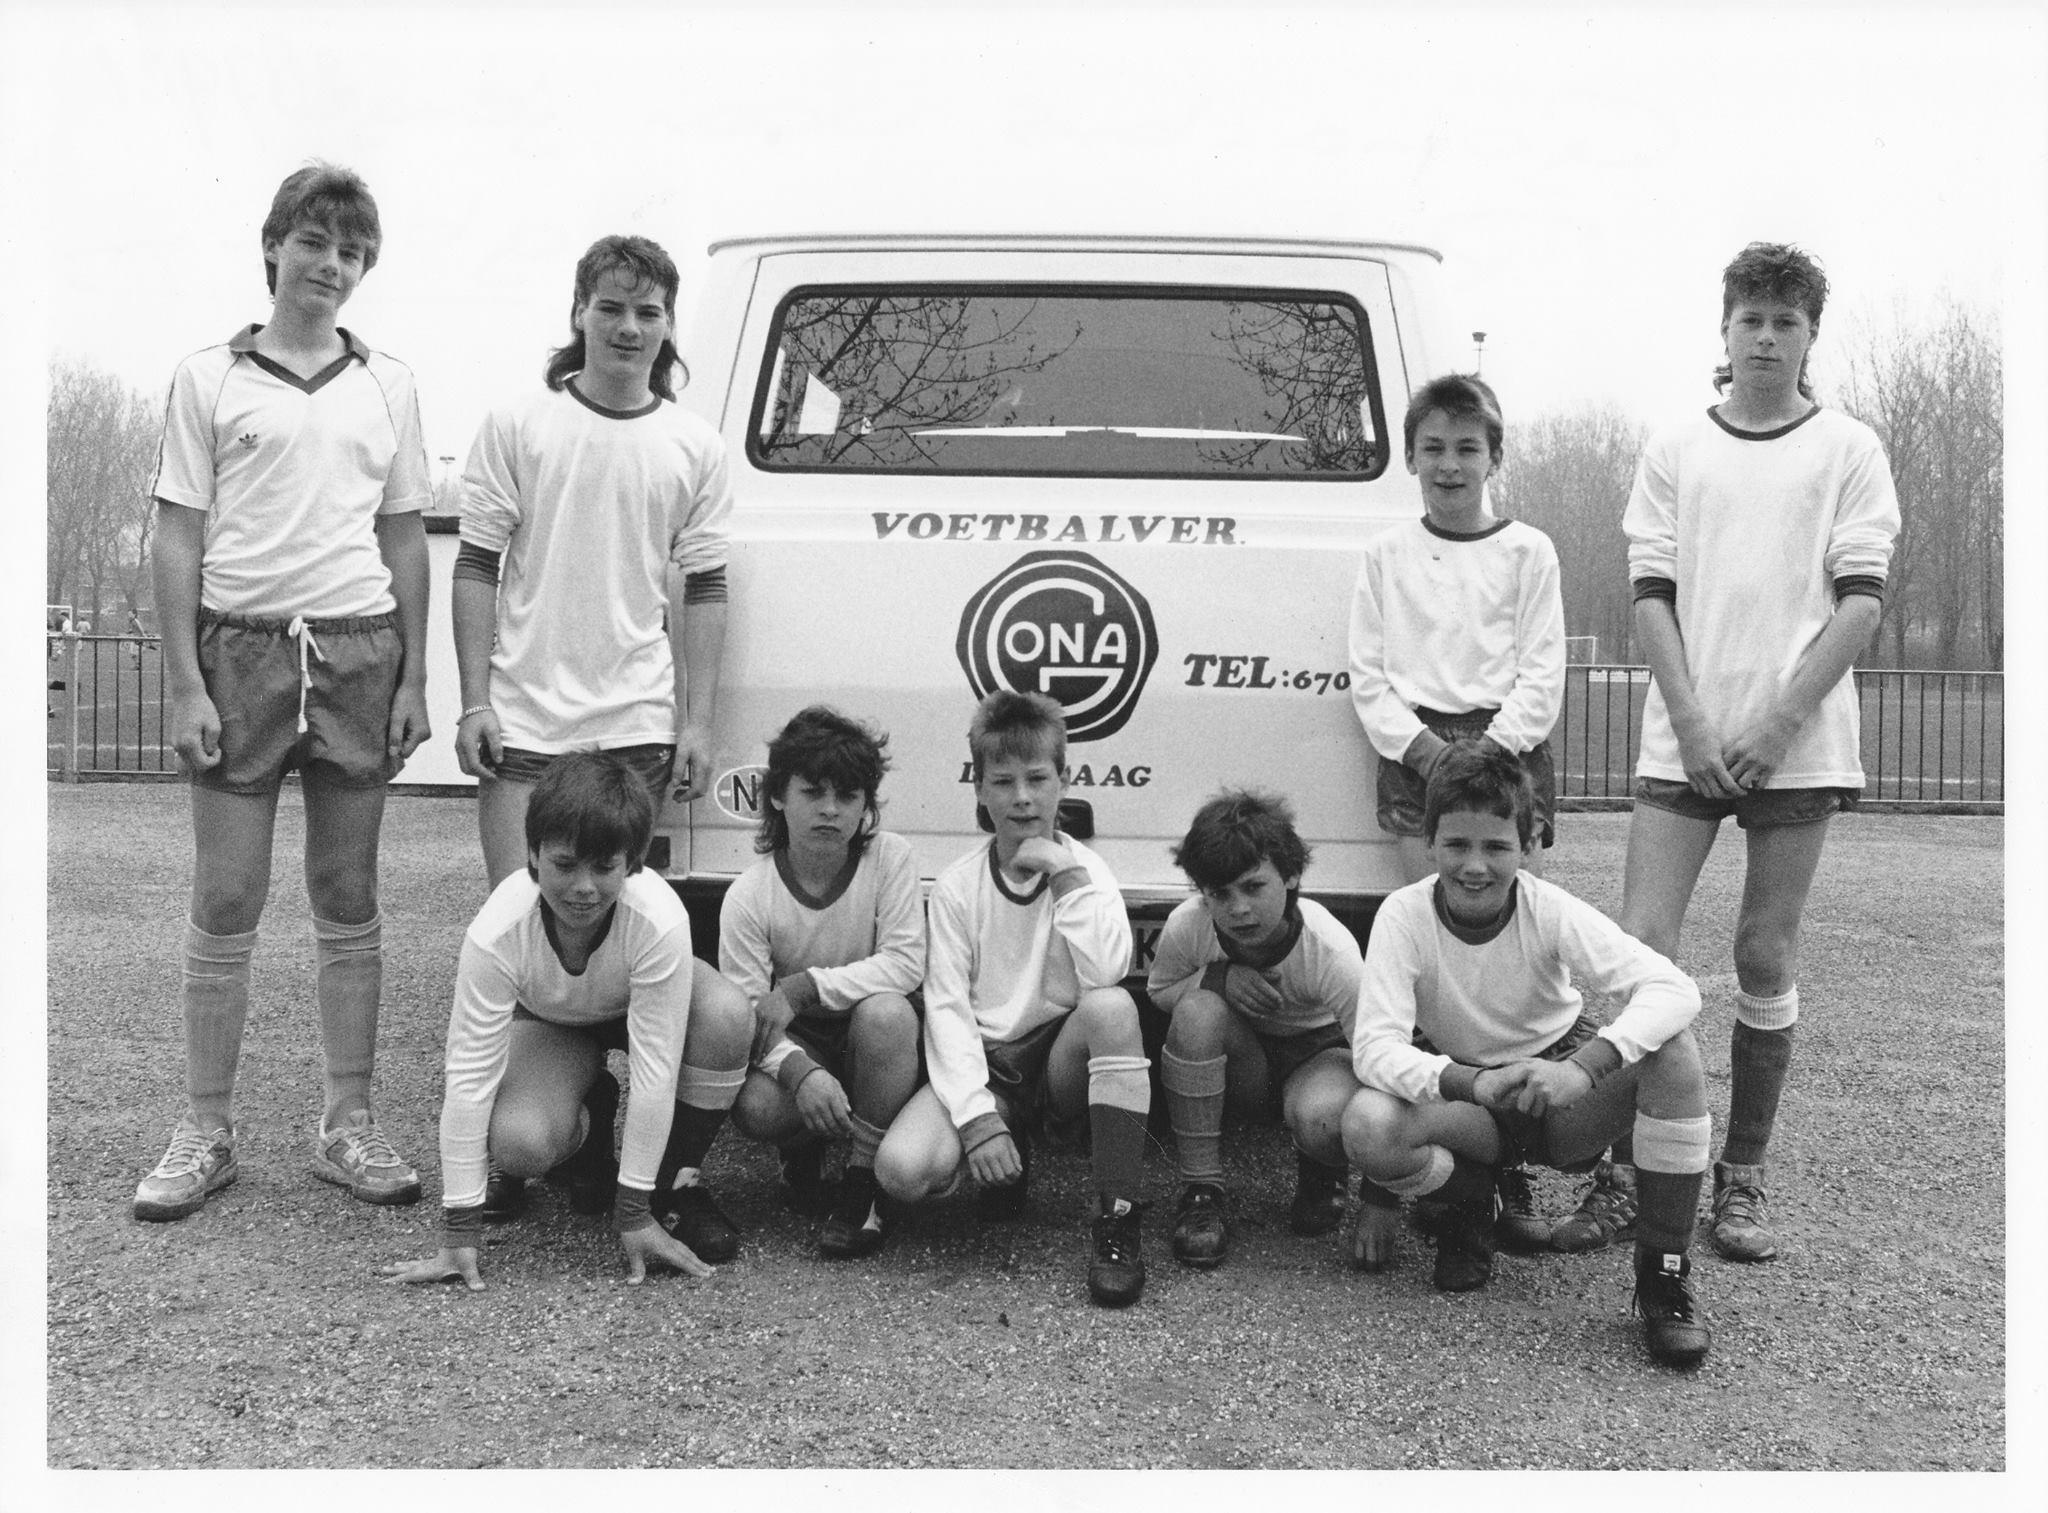 GONA bus 1985